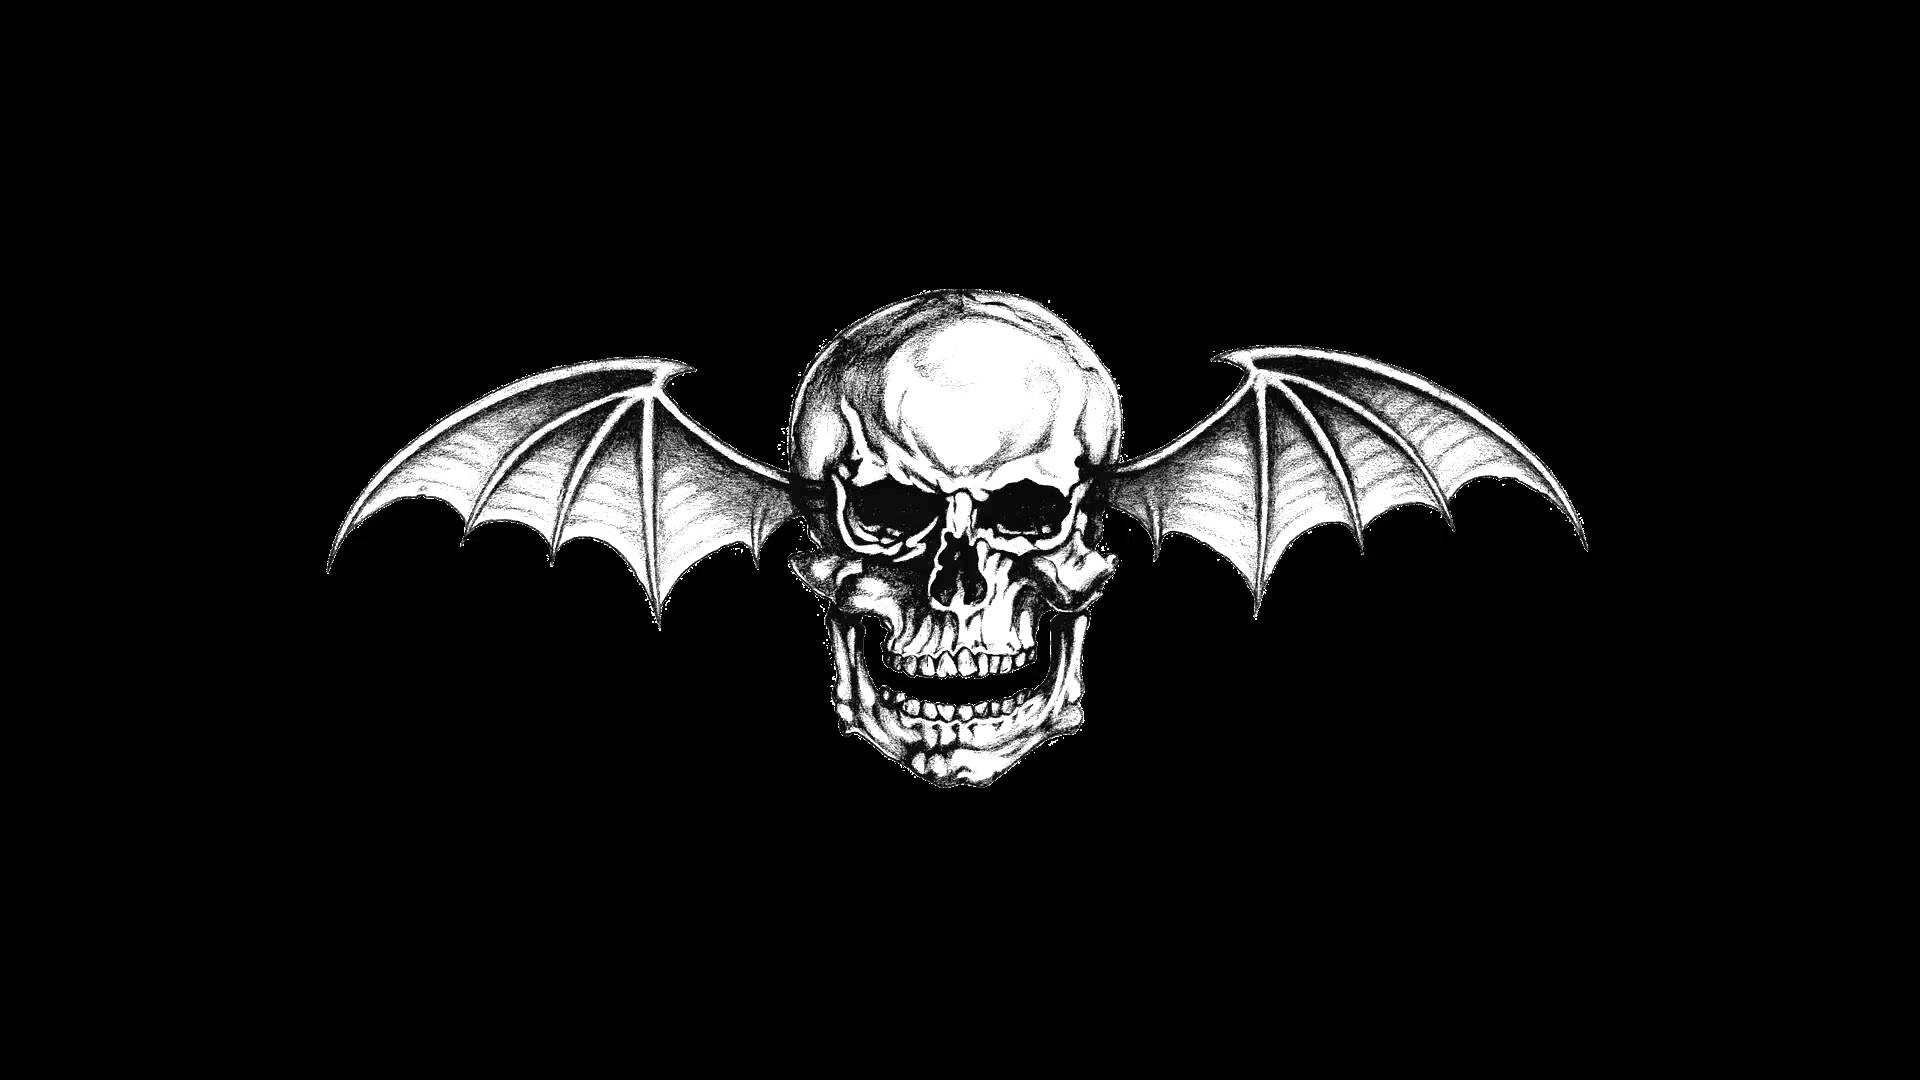 Avenged Sevenfold Deathbat Wallpaper (75+ images)